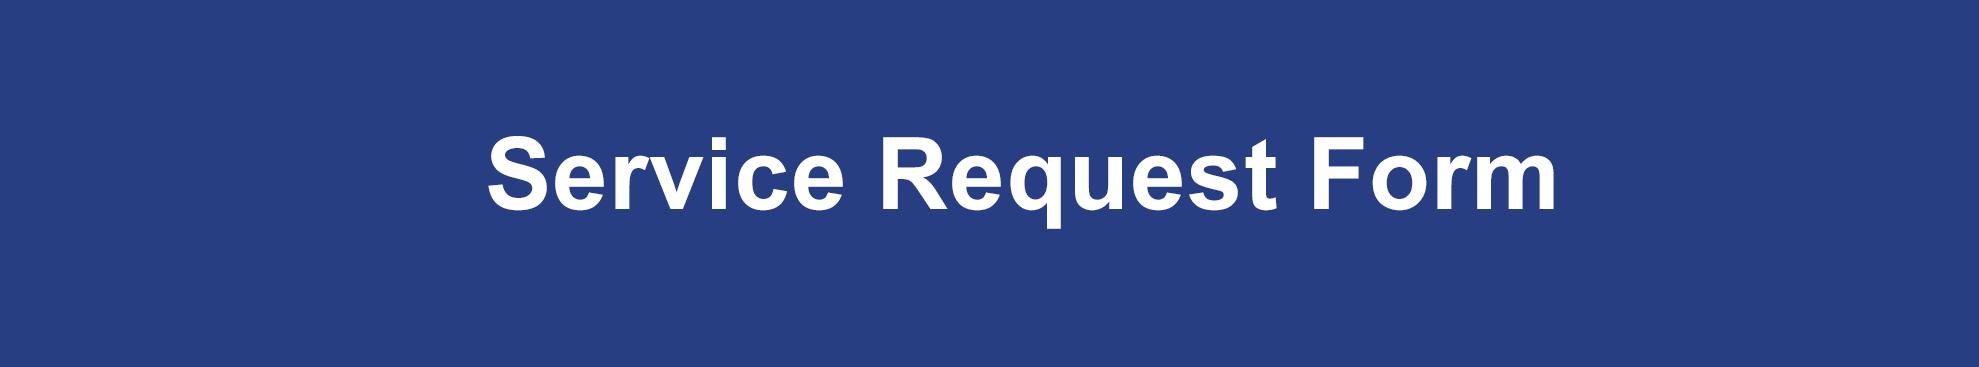 http://www.northeastheatcool.com.au/wp-content/uploads/2020/06/Service-Request.png